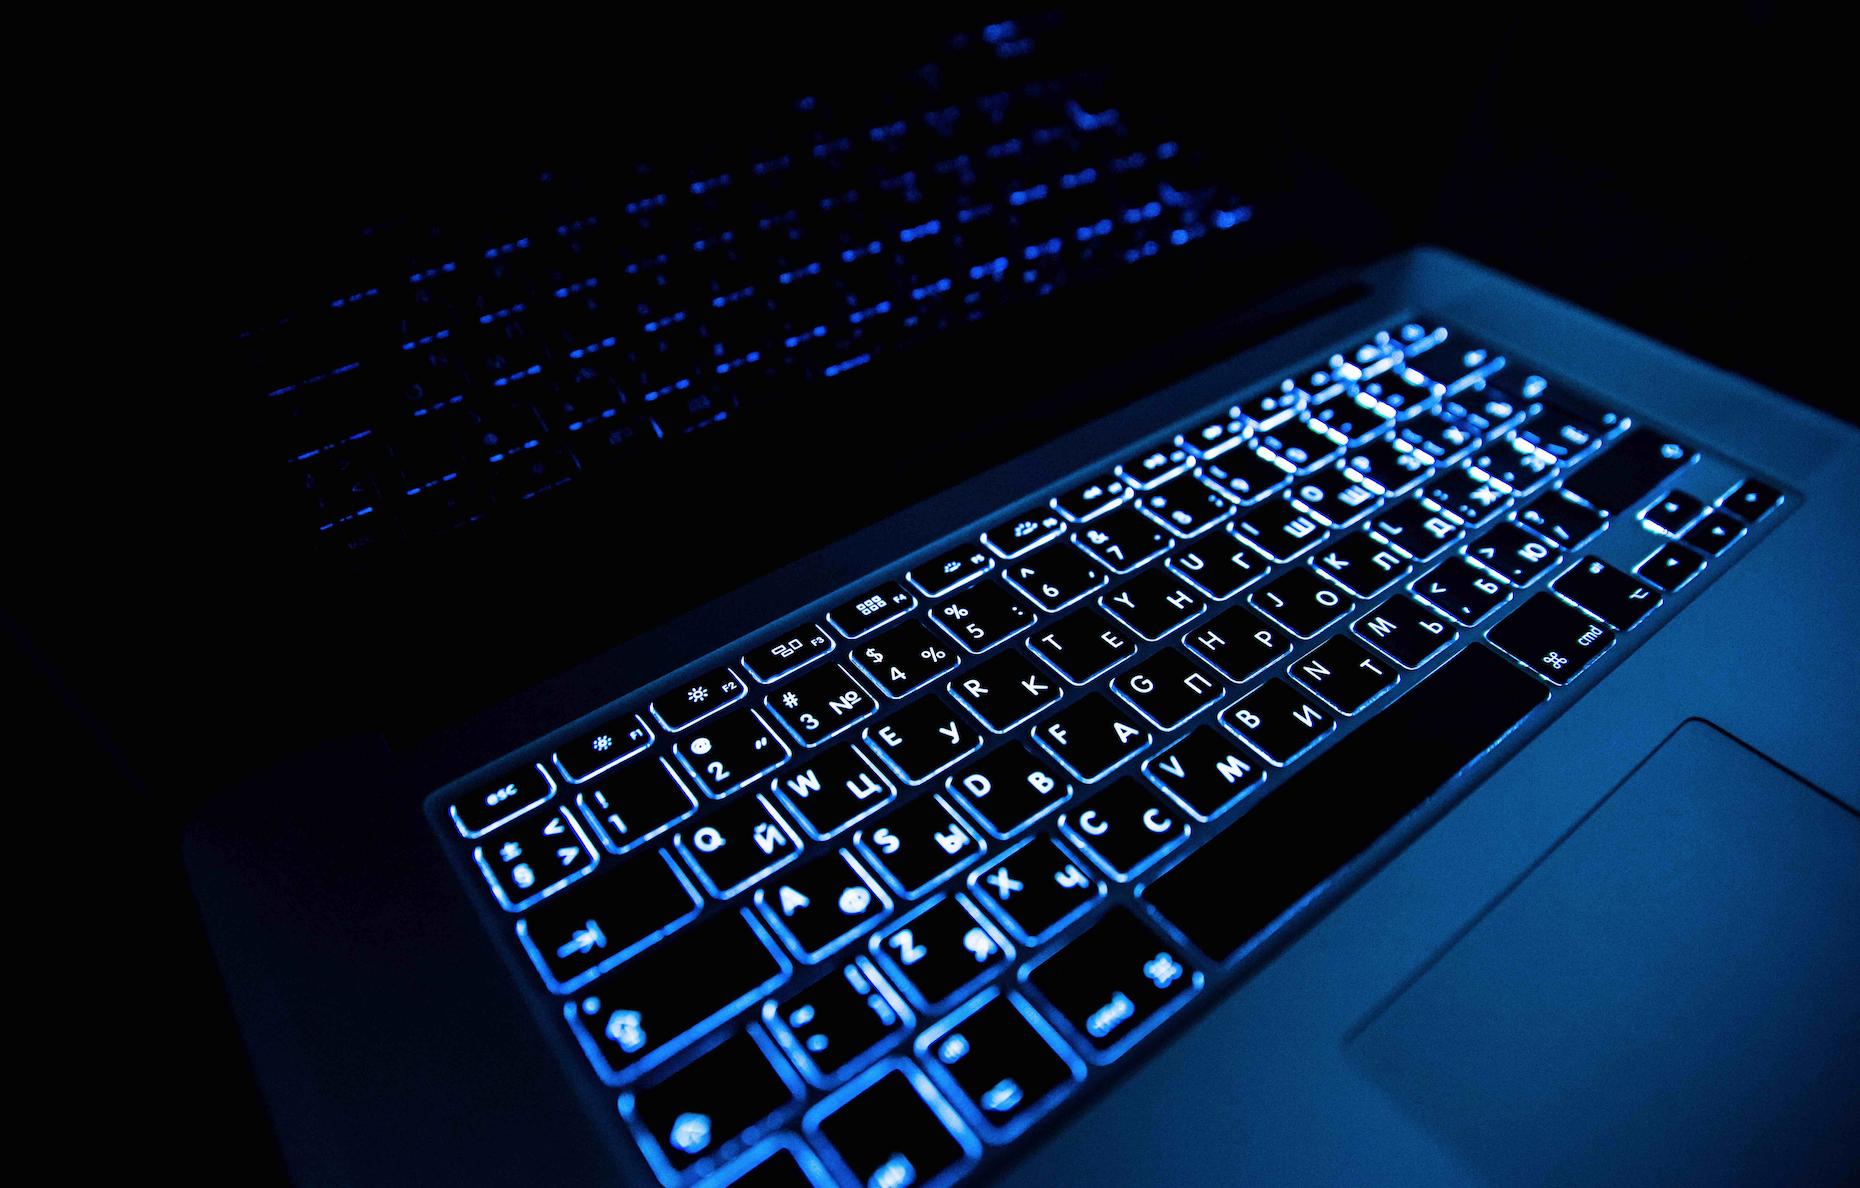 Intel Enigma Гай Зюскинд